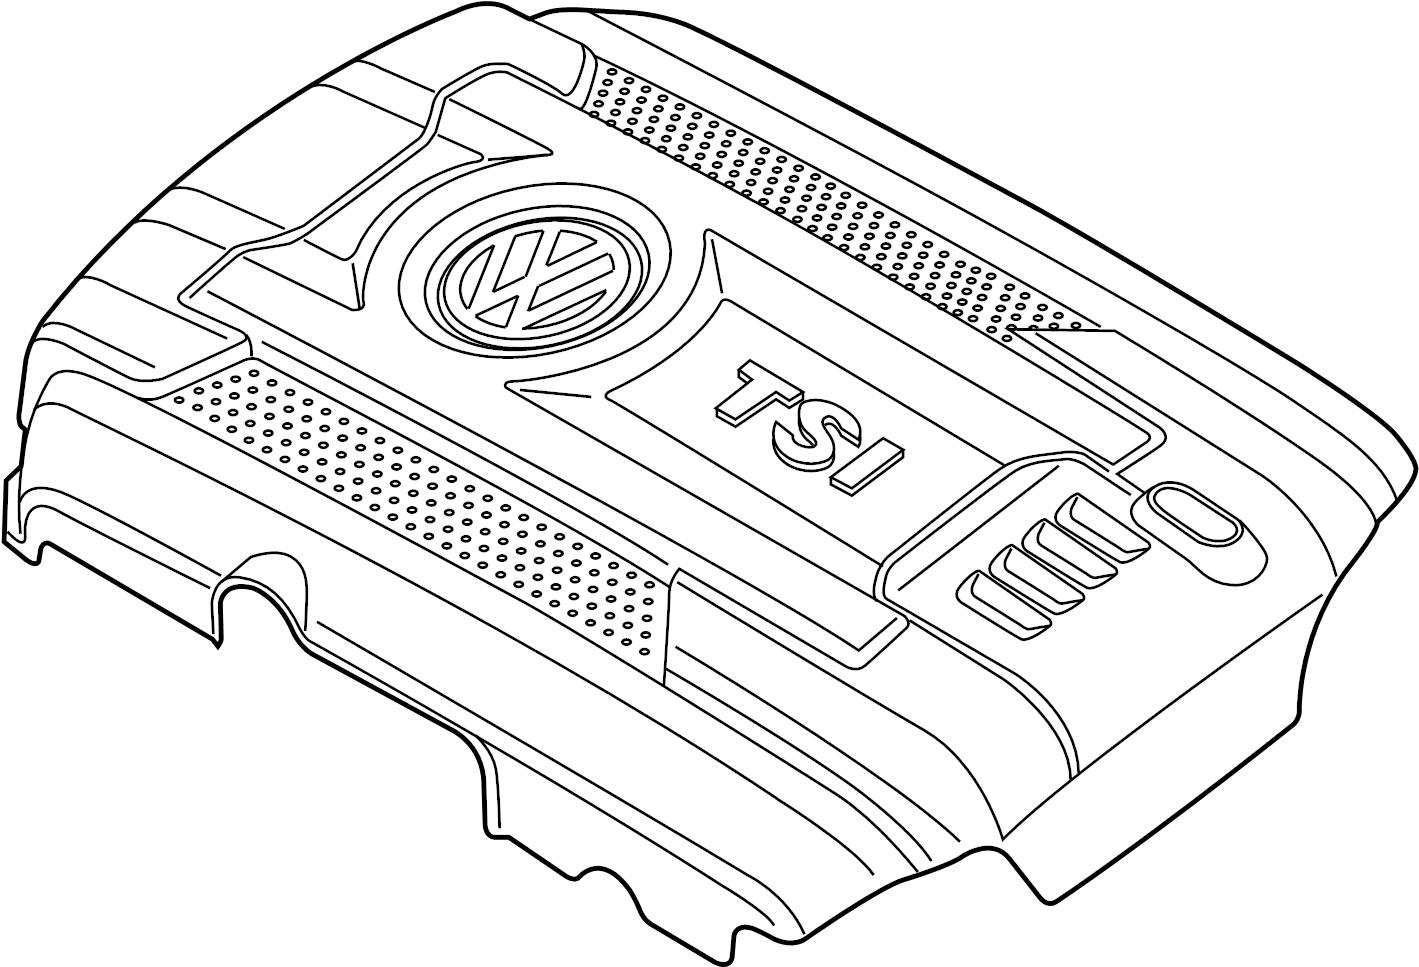 Volkswagen Jetta GLI Engine cover. 1.8 LITER. 2014-18. VIN